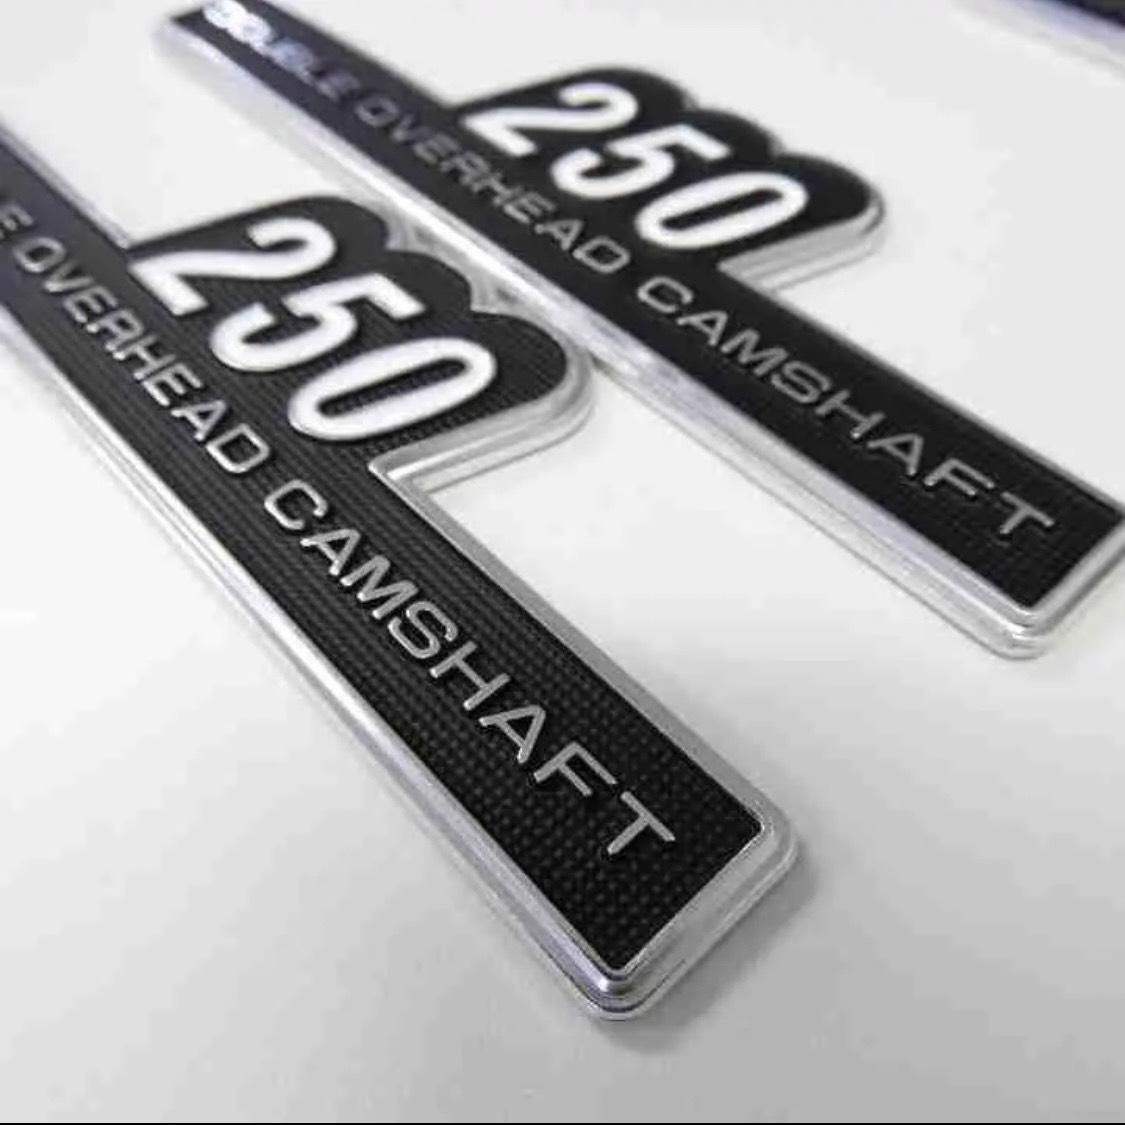 KAWASAKI サイドカバーエンブレム Z2タイプ 250 貼り付け カワサキ